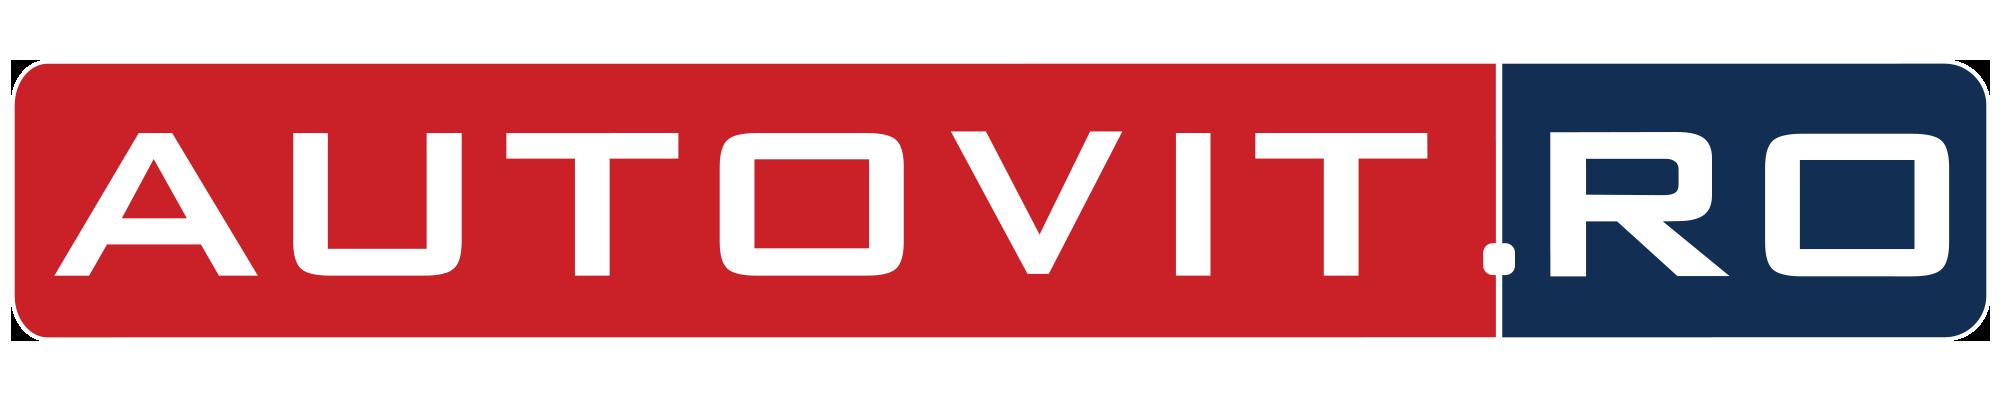 Autovit